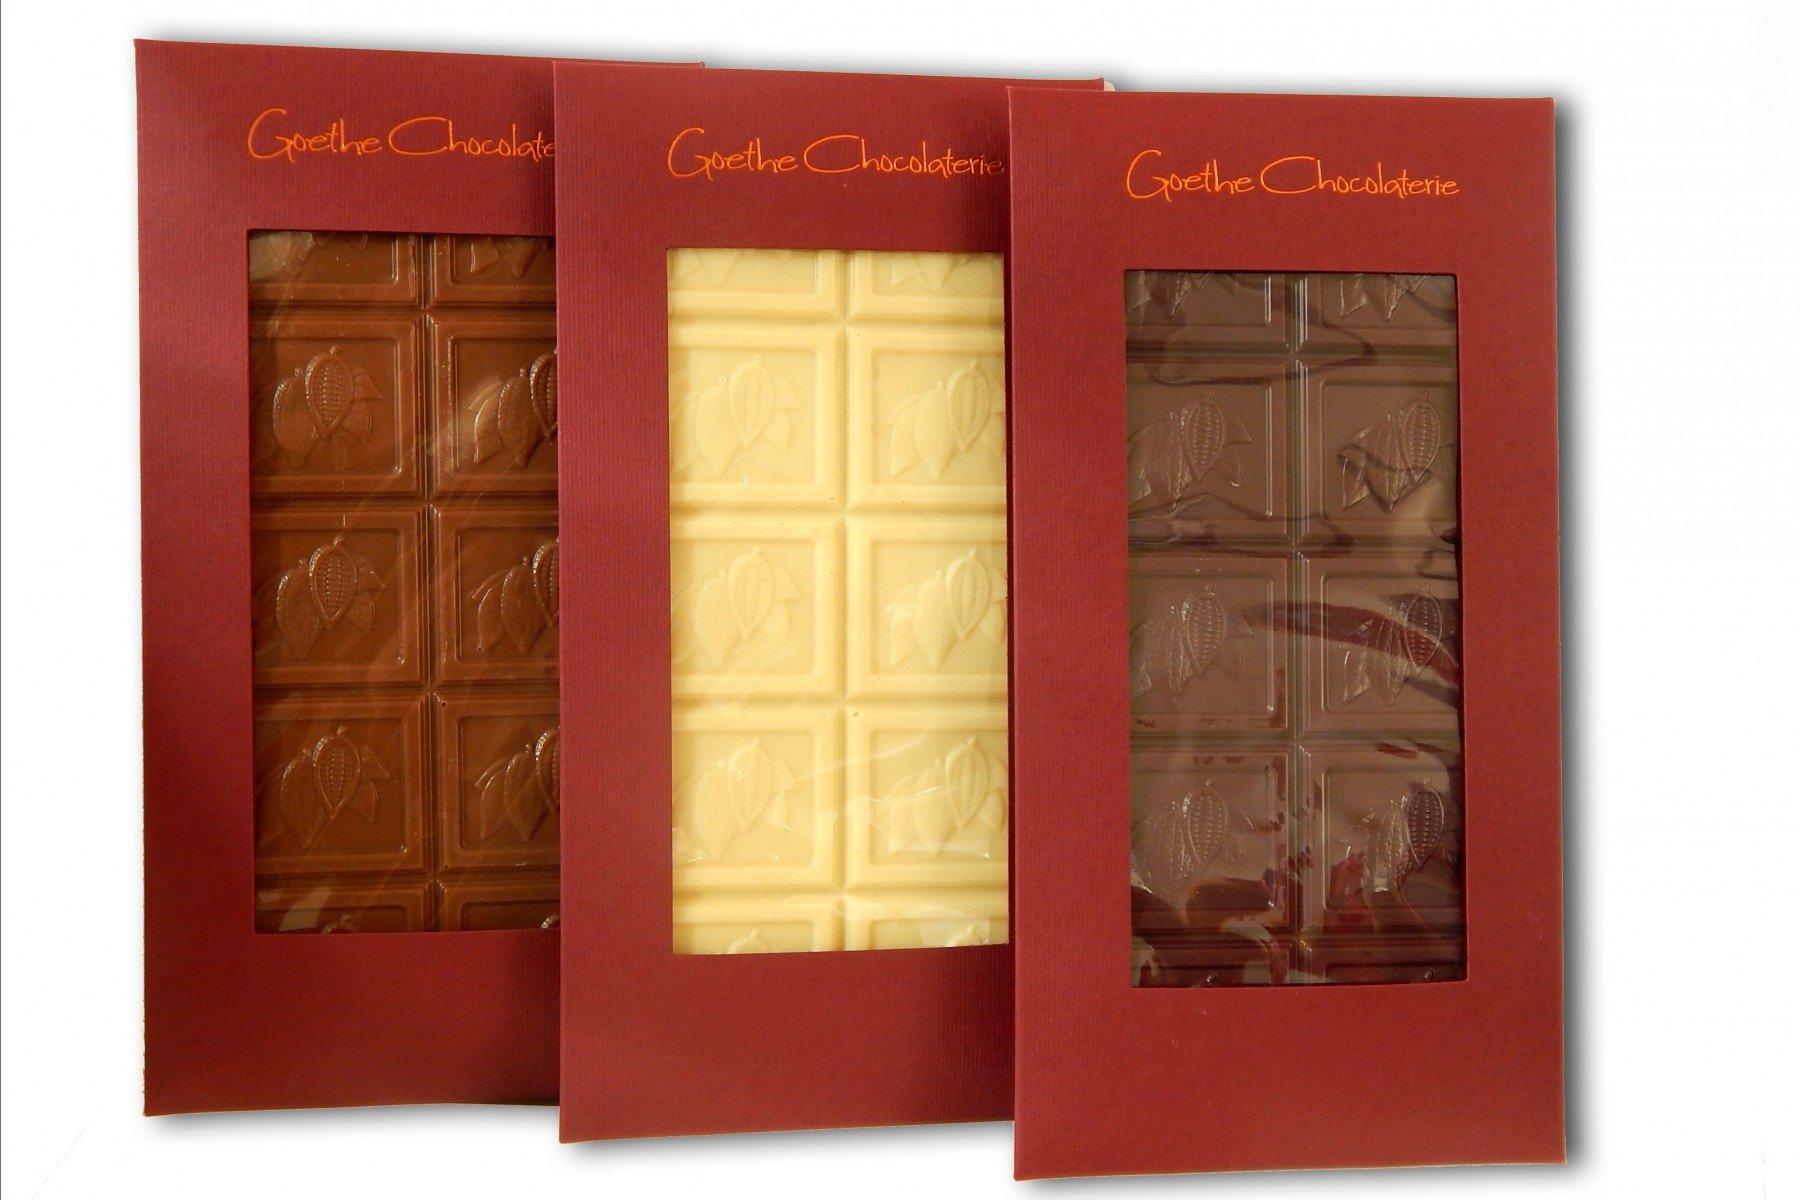 Neue Schokoladen